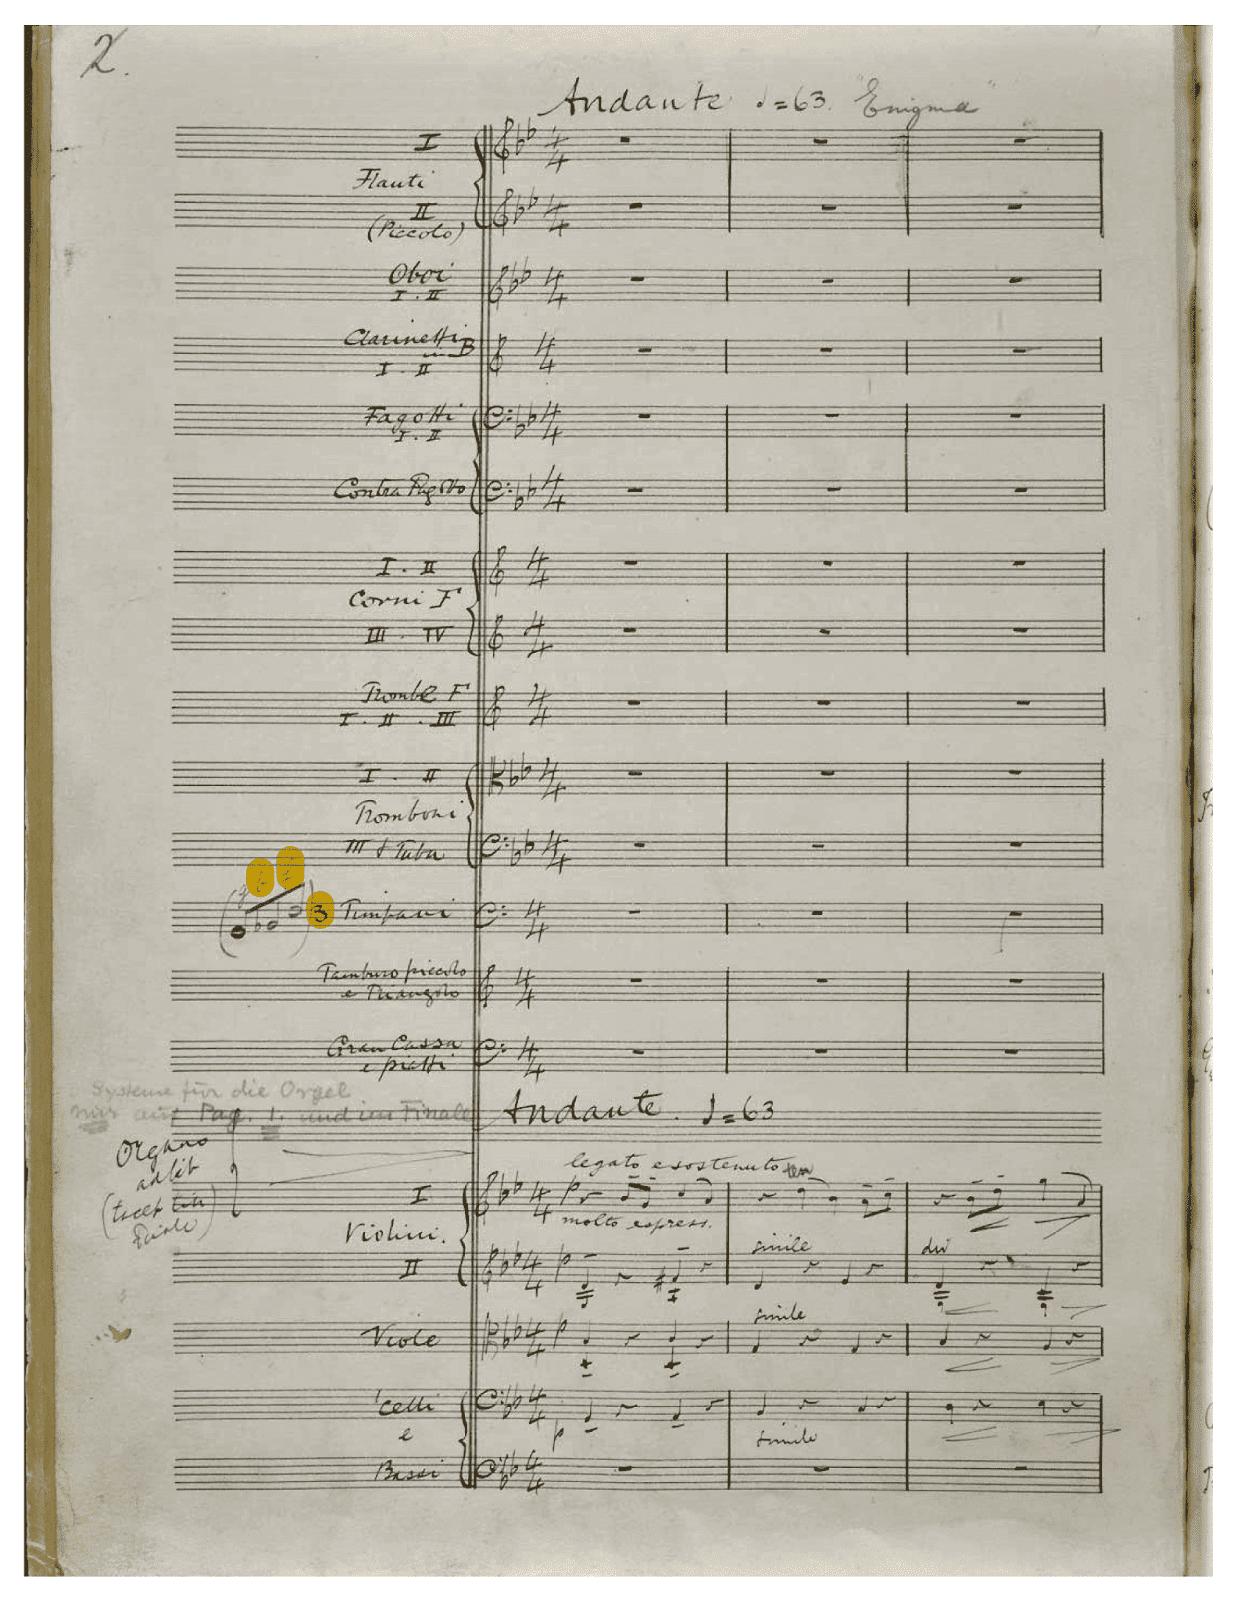 Enigma Theme – Elgar's Enigmas Exposed